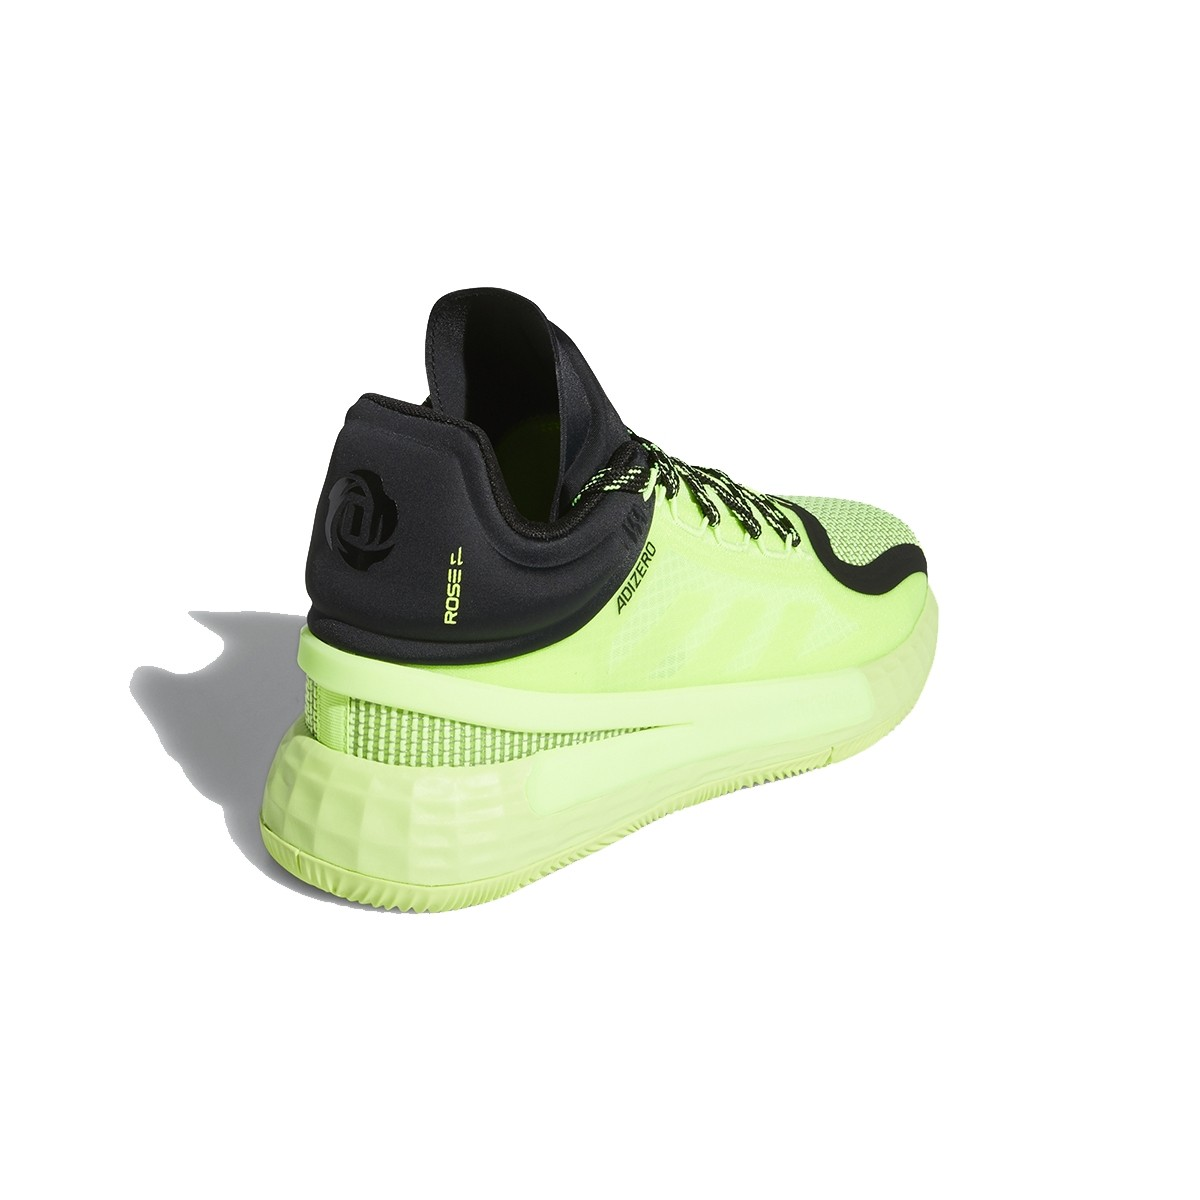 ADIDAS D Rose 11 'Signal Green'-FU7405